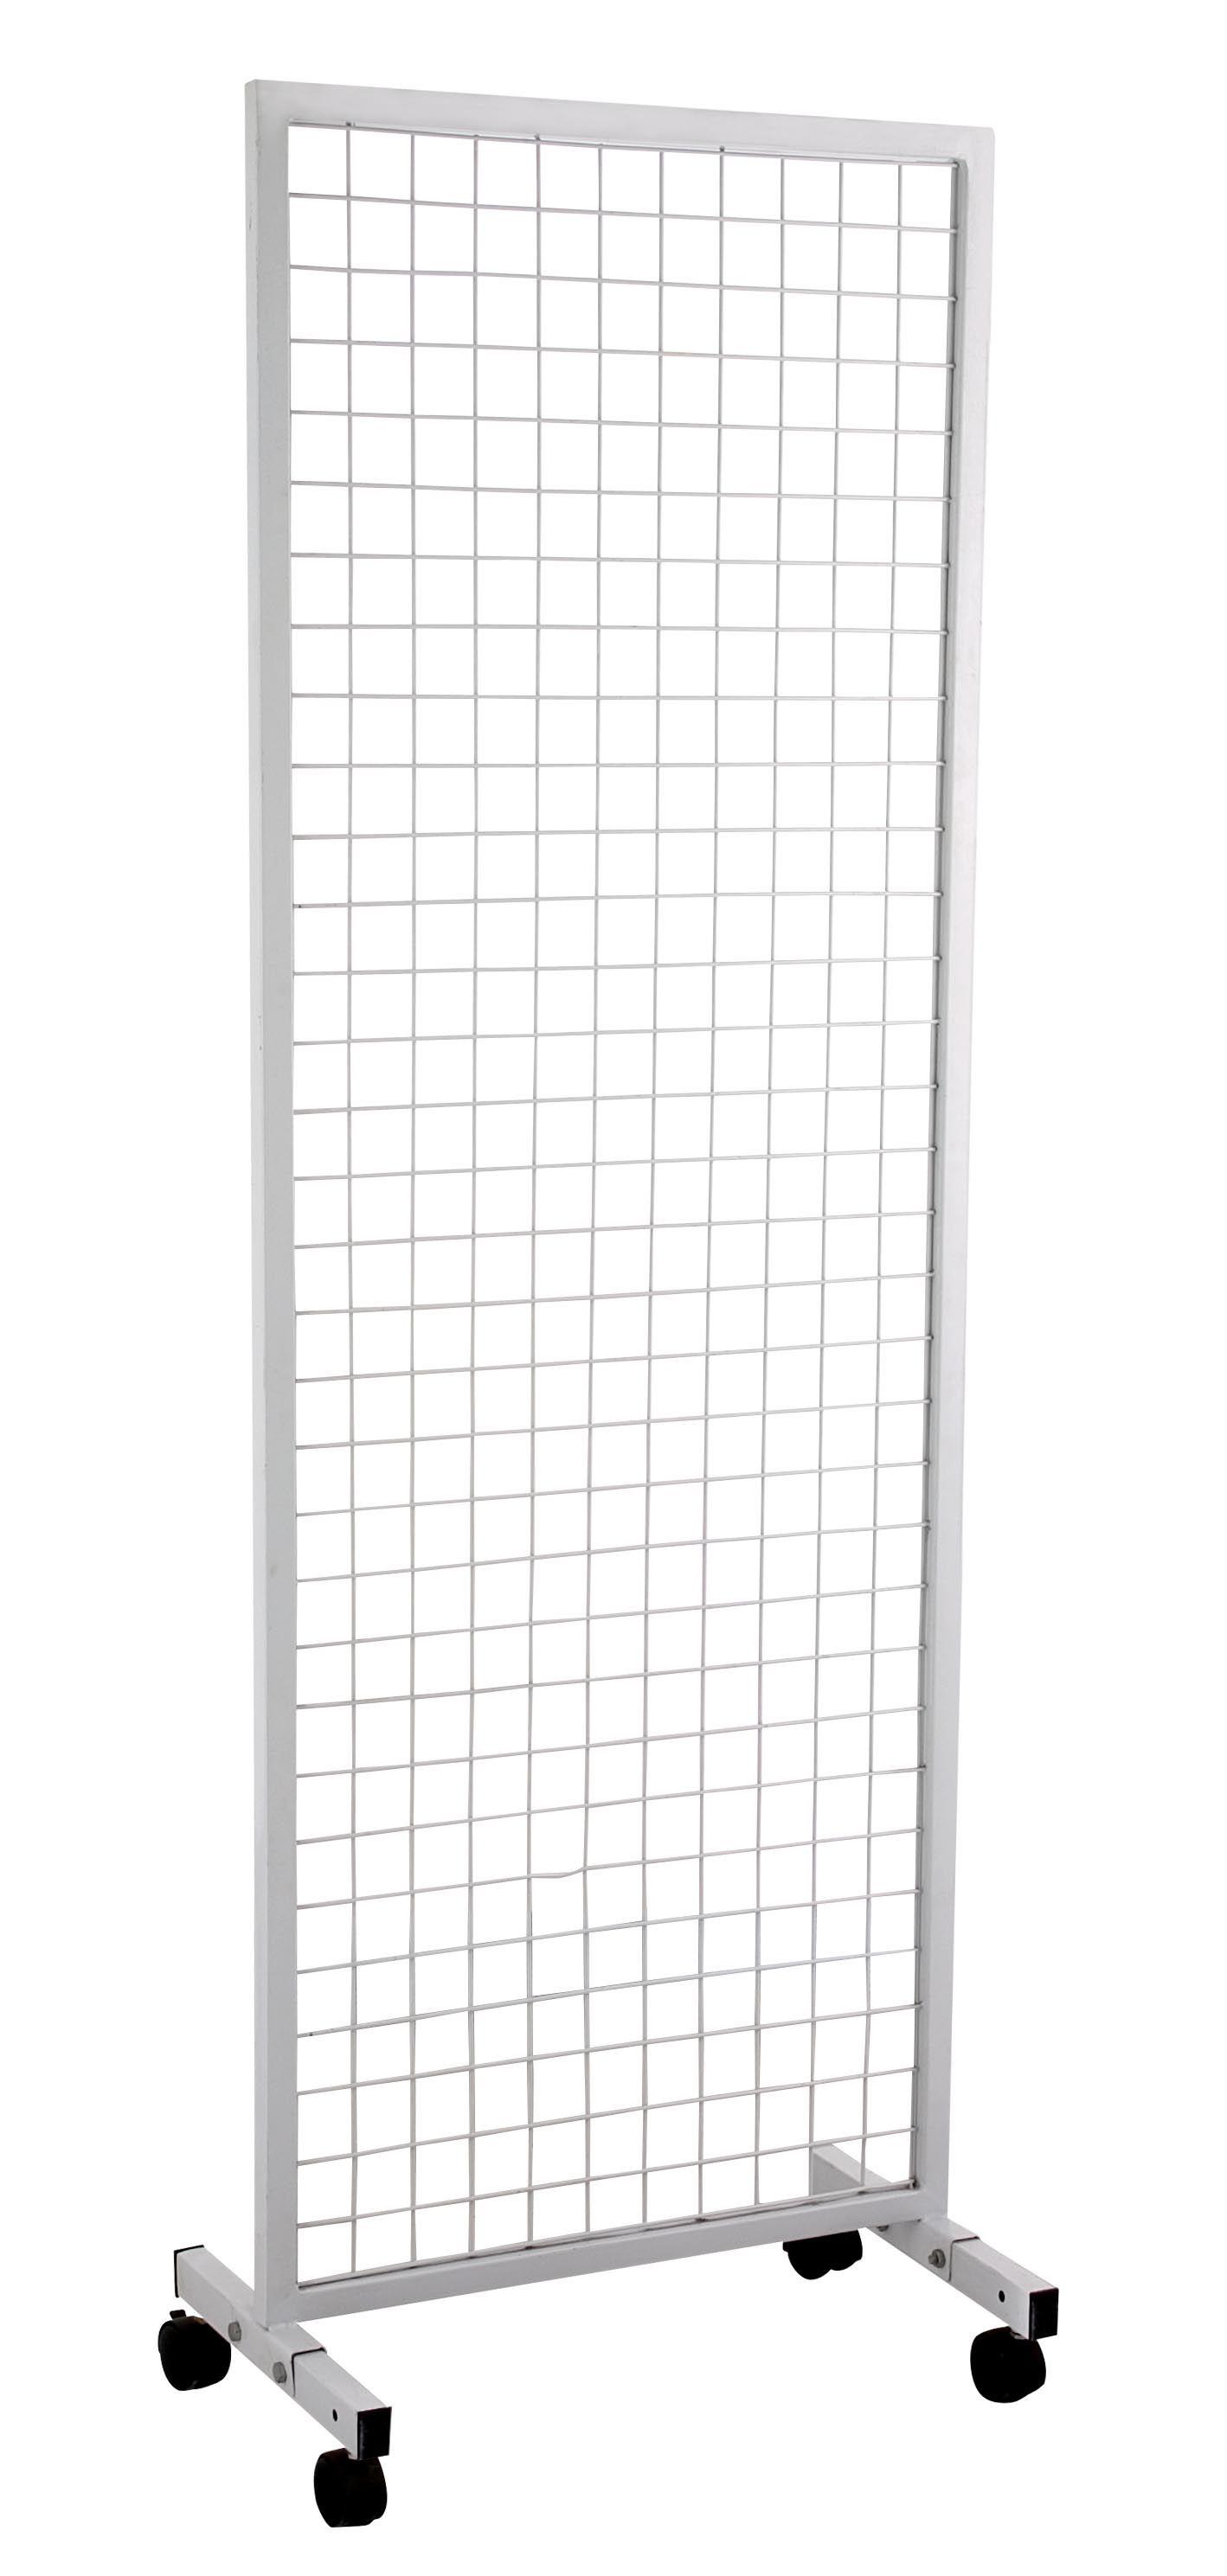 Wire Mesh Display Rack (HYX-WD09) | Pinterest | Wire mesh, Display ...